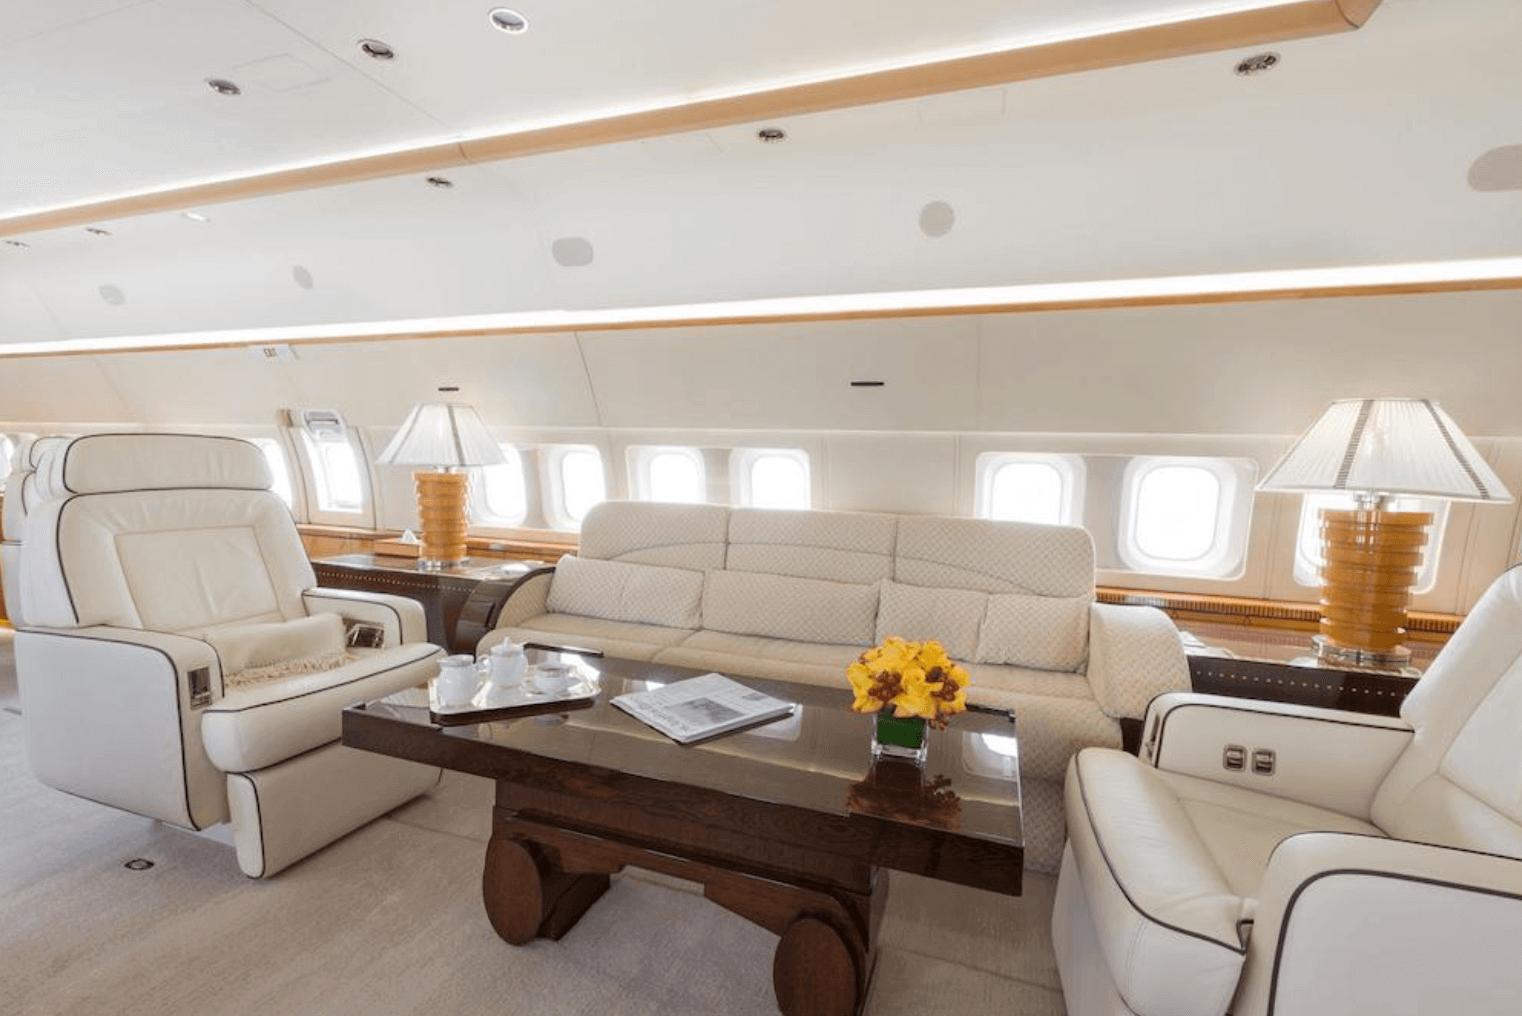 Silver Air jet iç tasarım